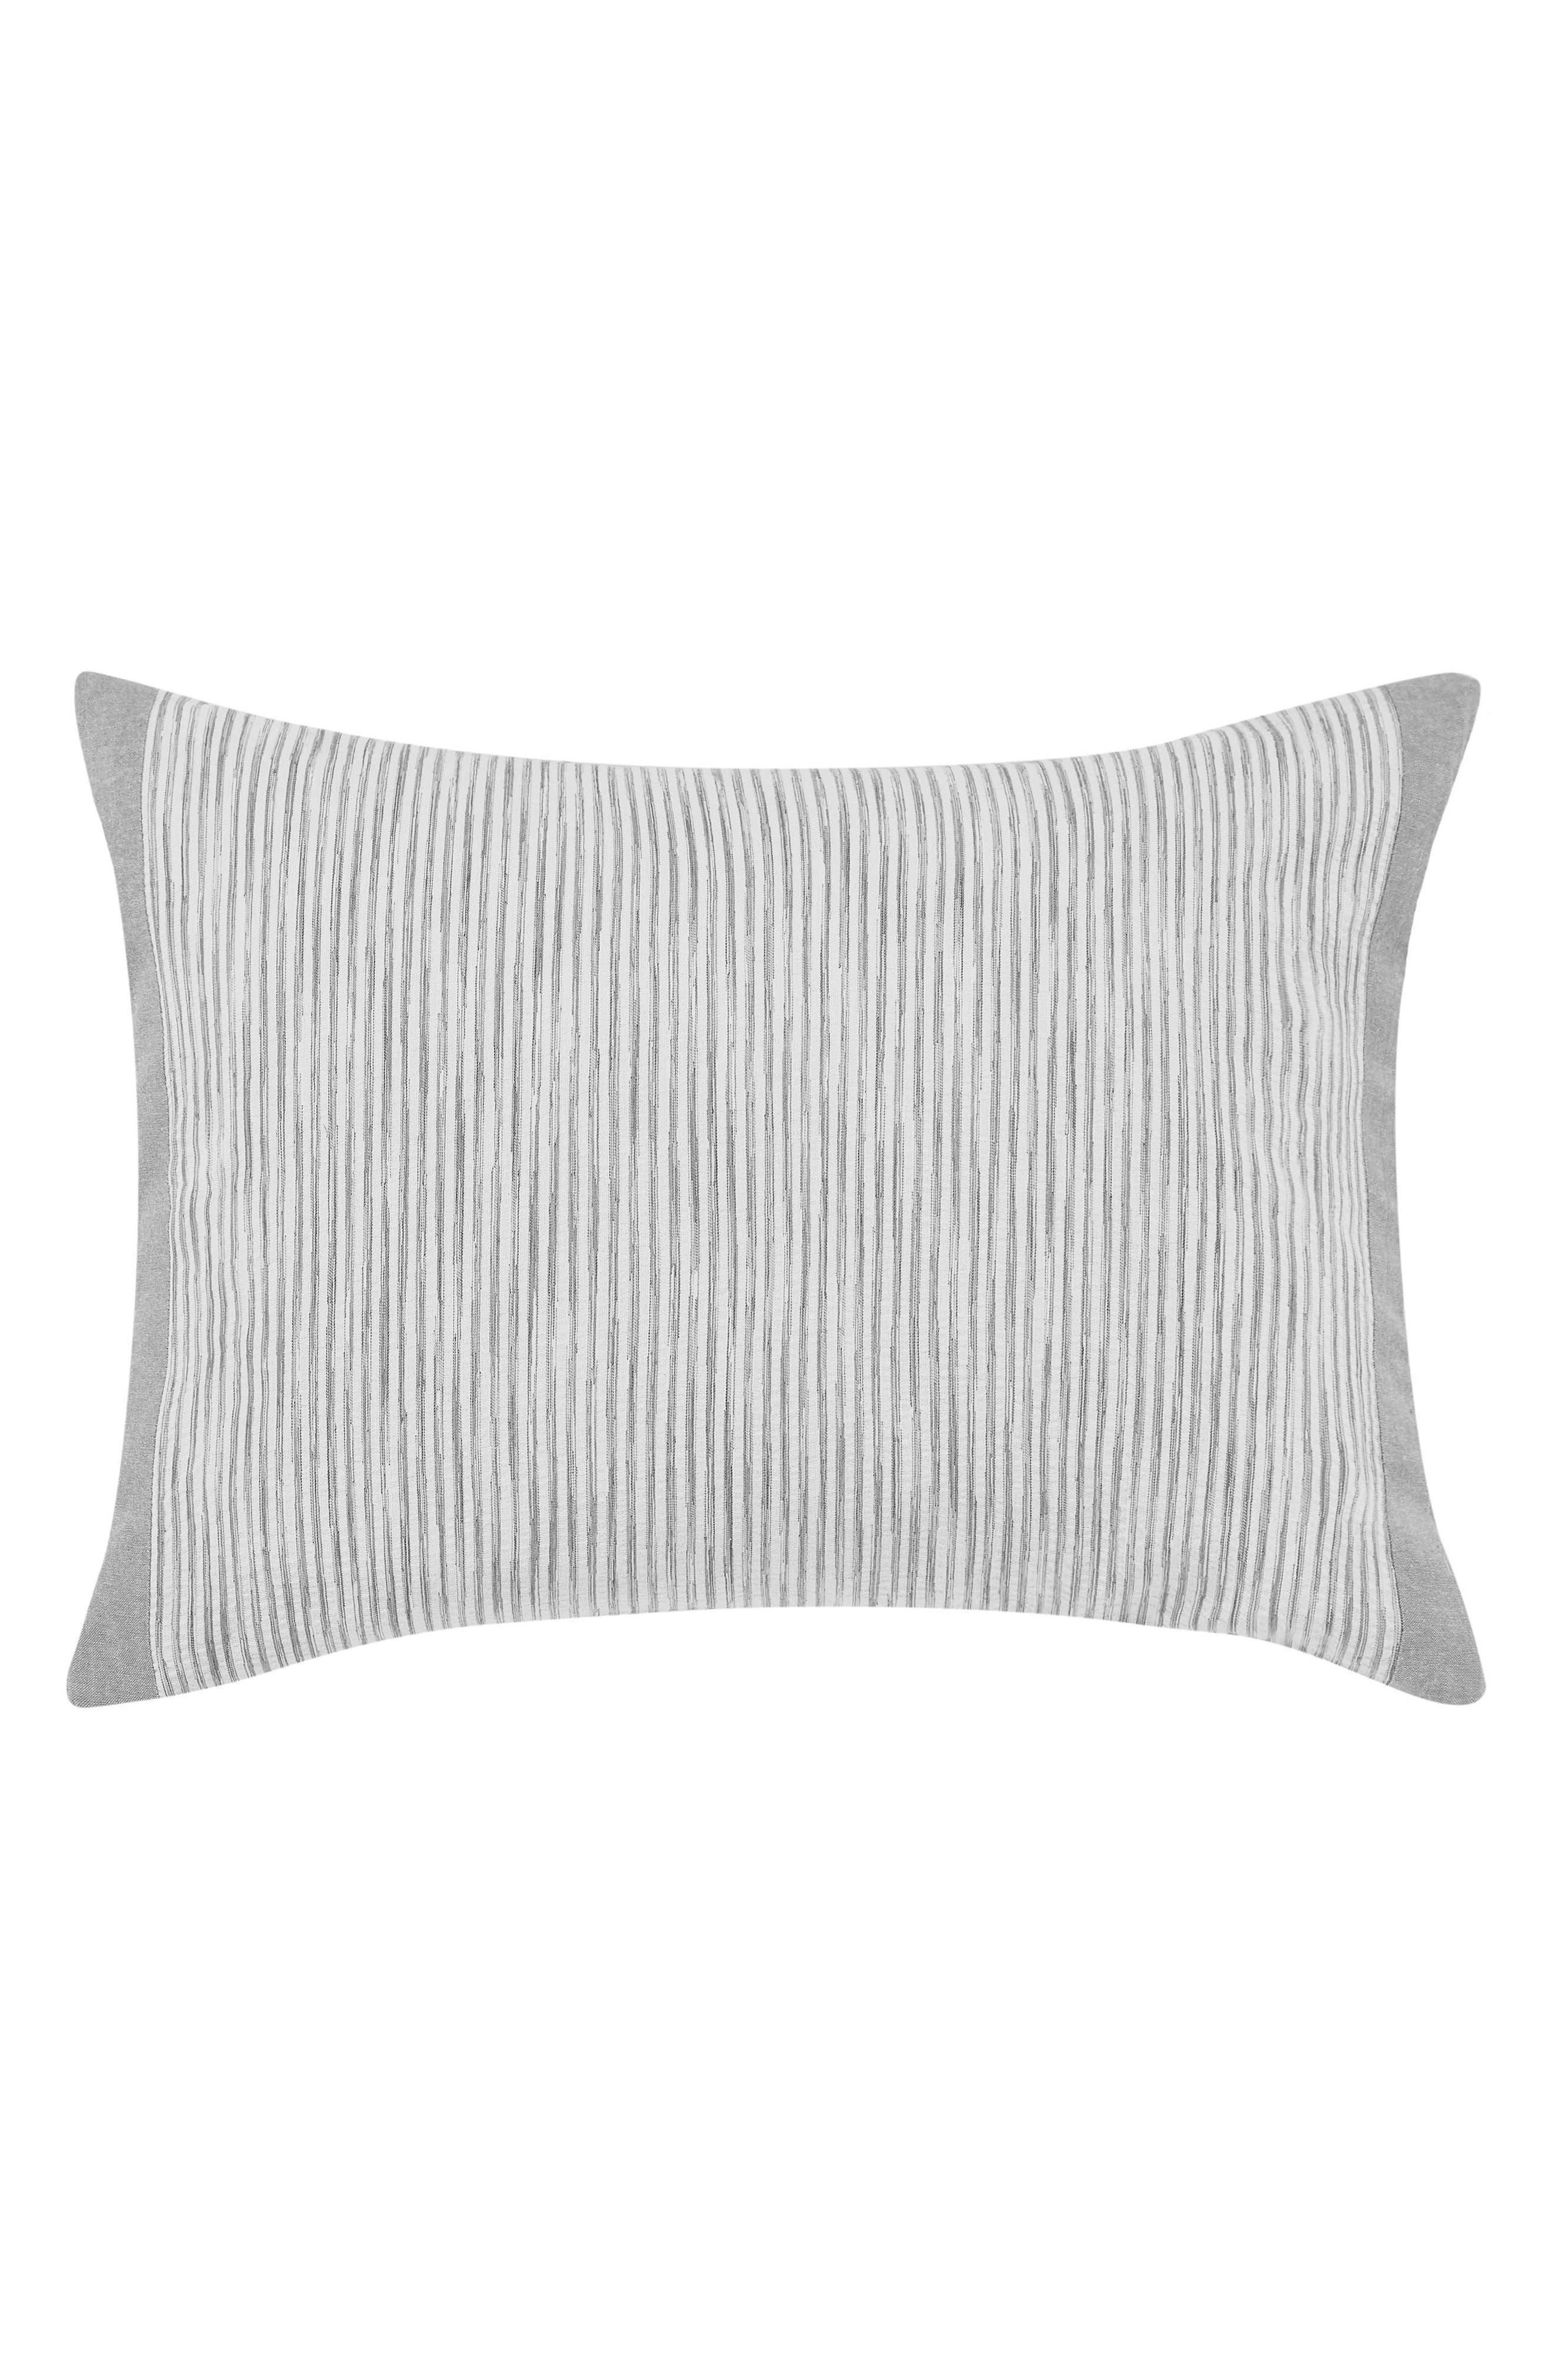 Alternate Image 1 Selected - ED Ellen DeGeneres Claremont Stripe Accent Pillow